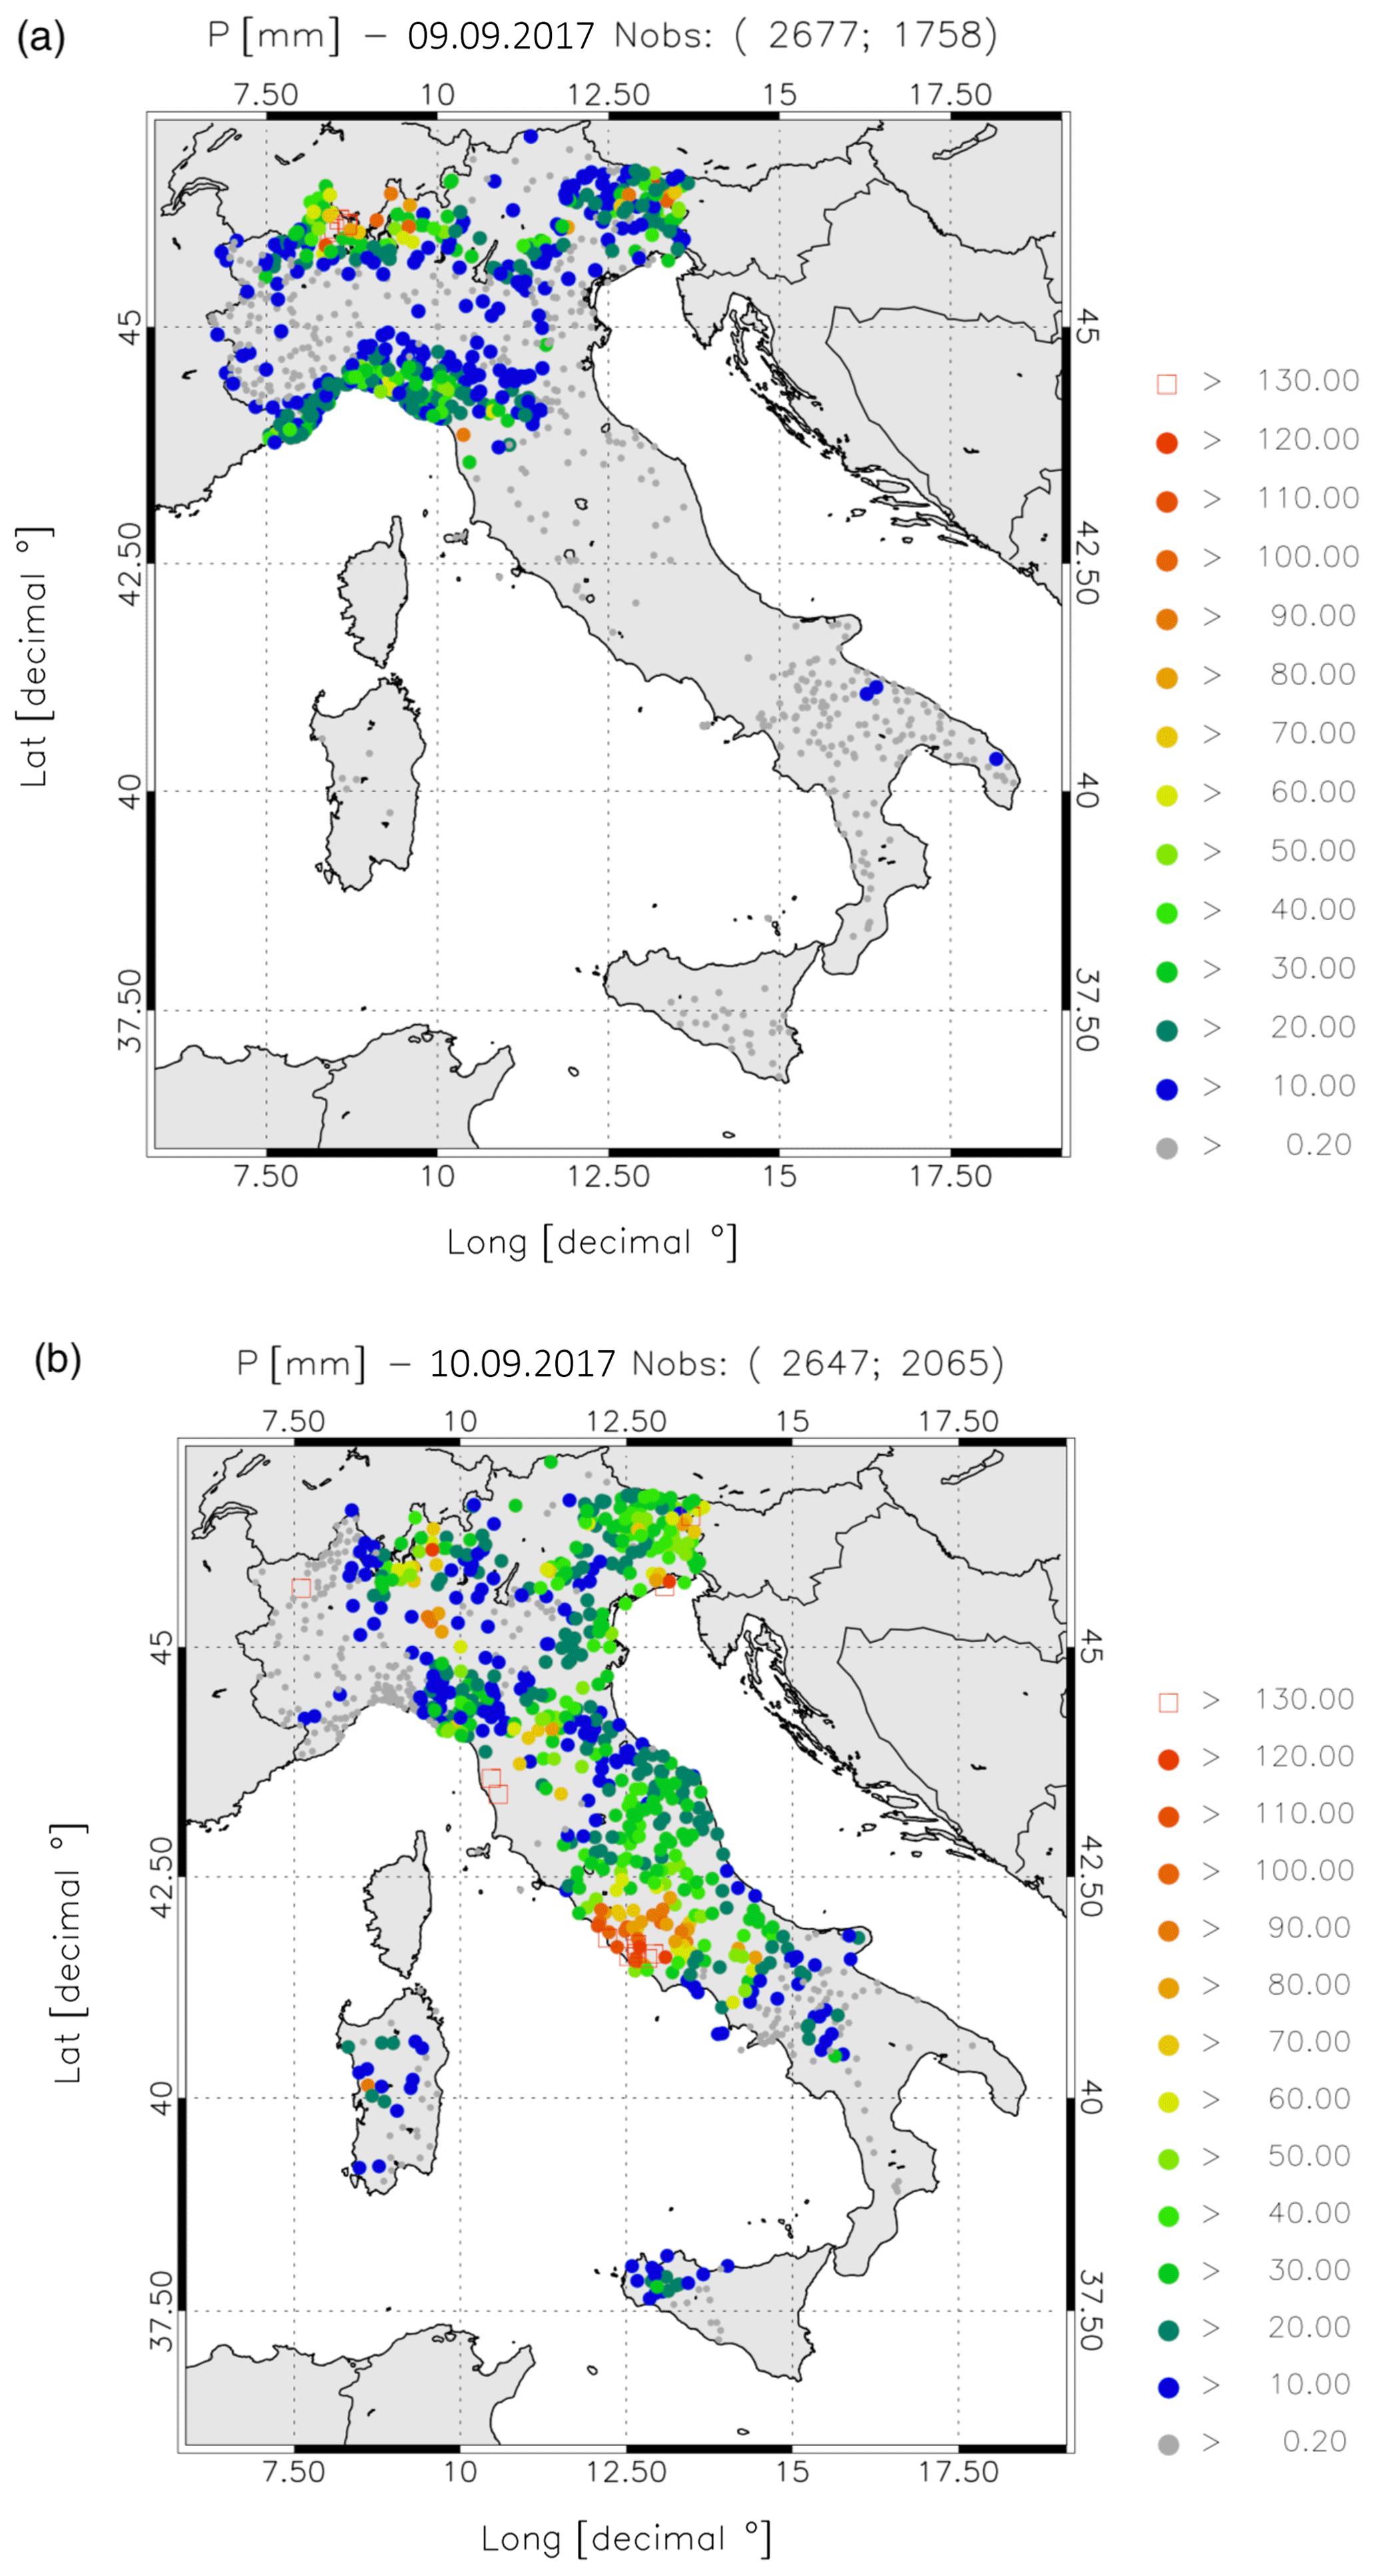 NHESS - The impact of lightning and radar reflectivity